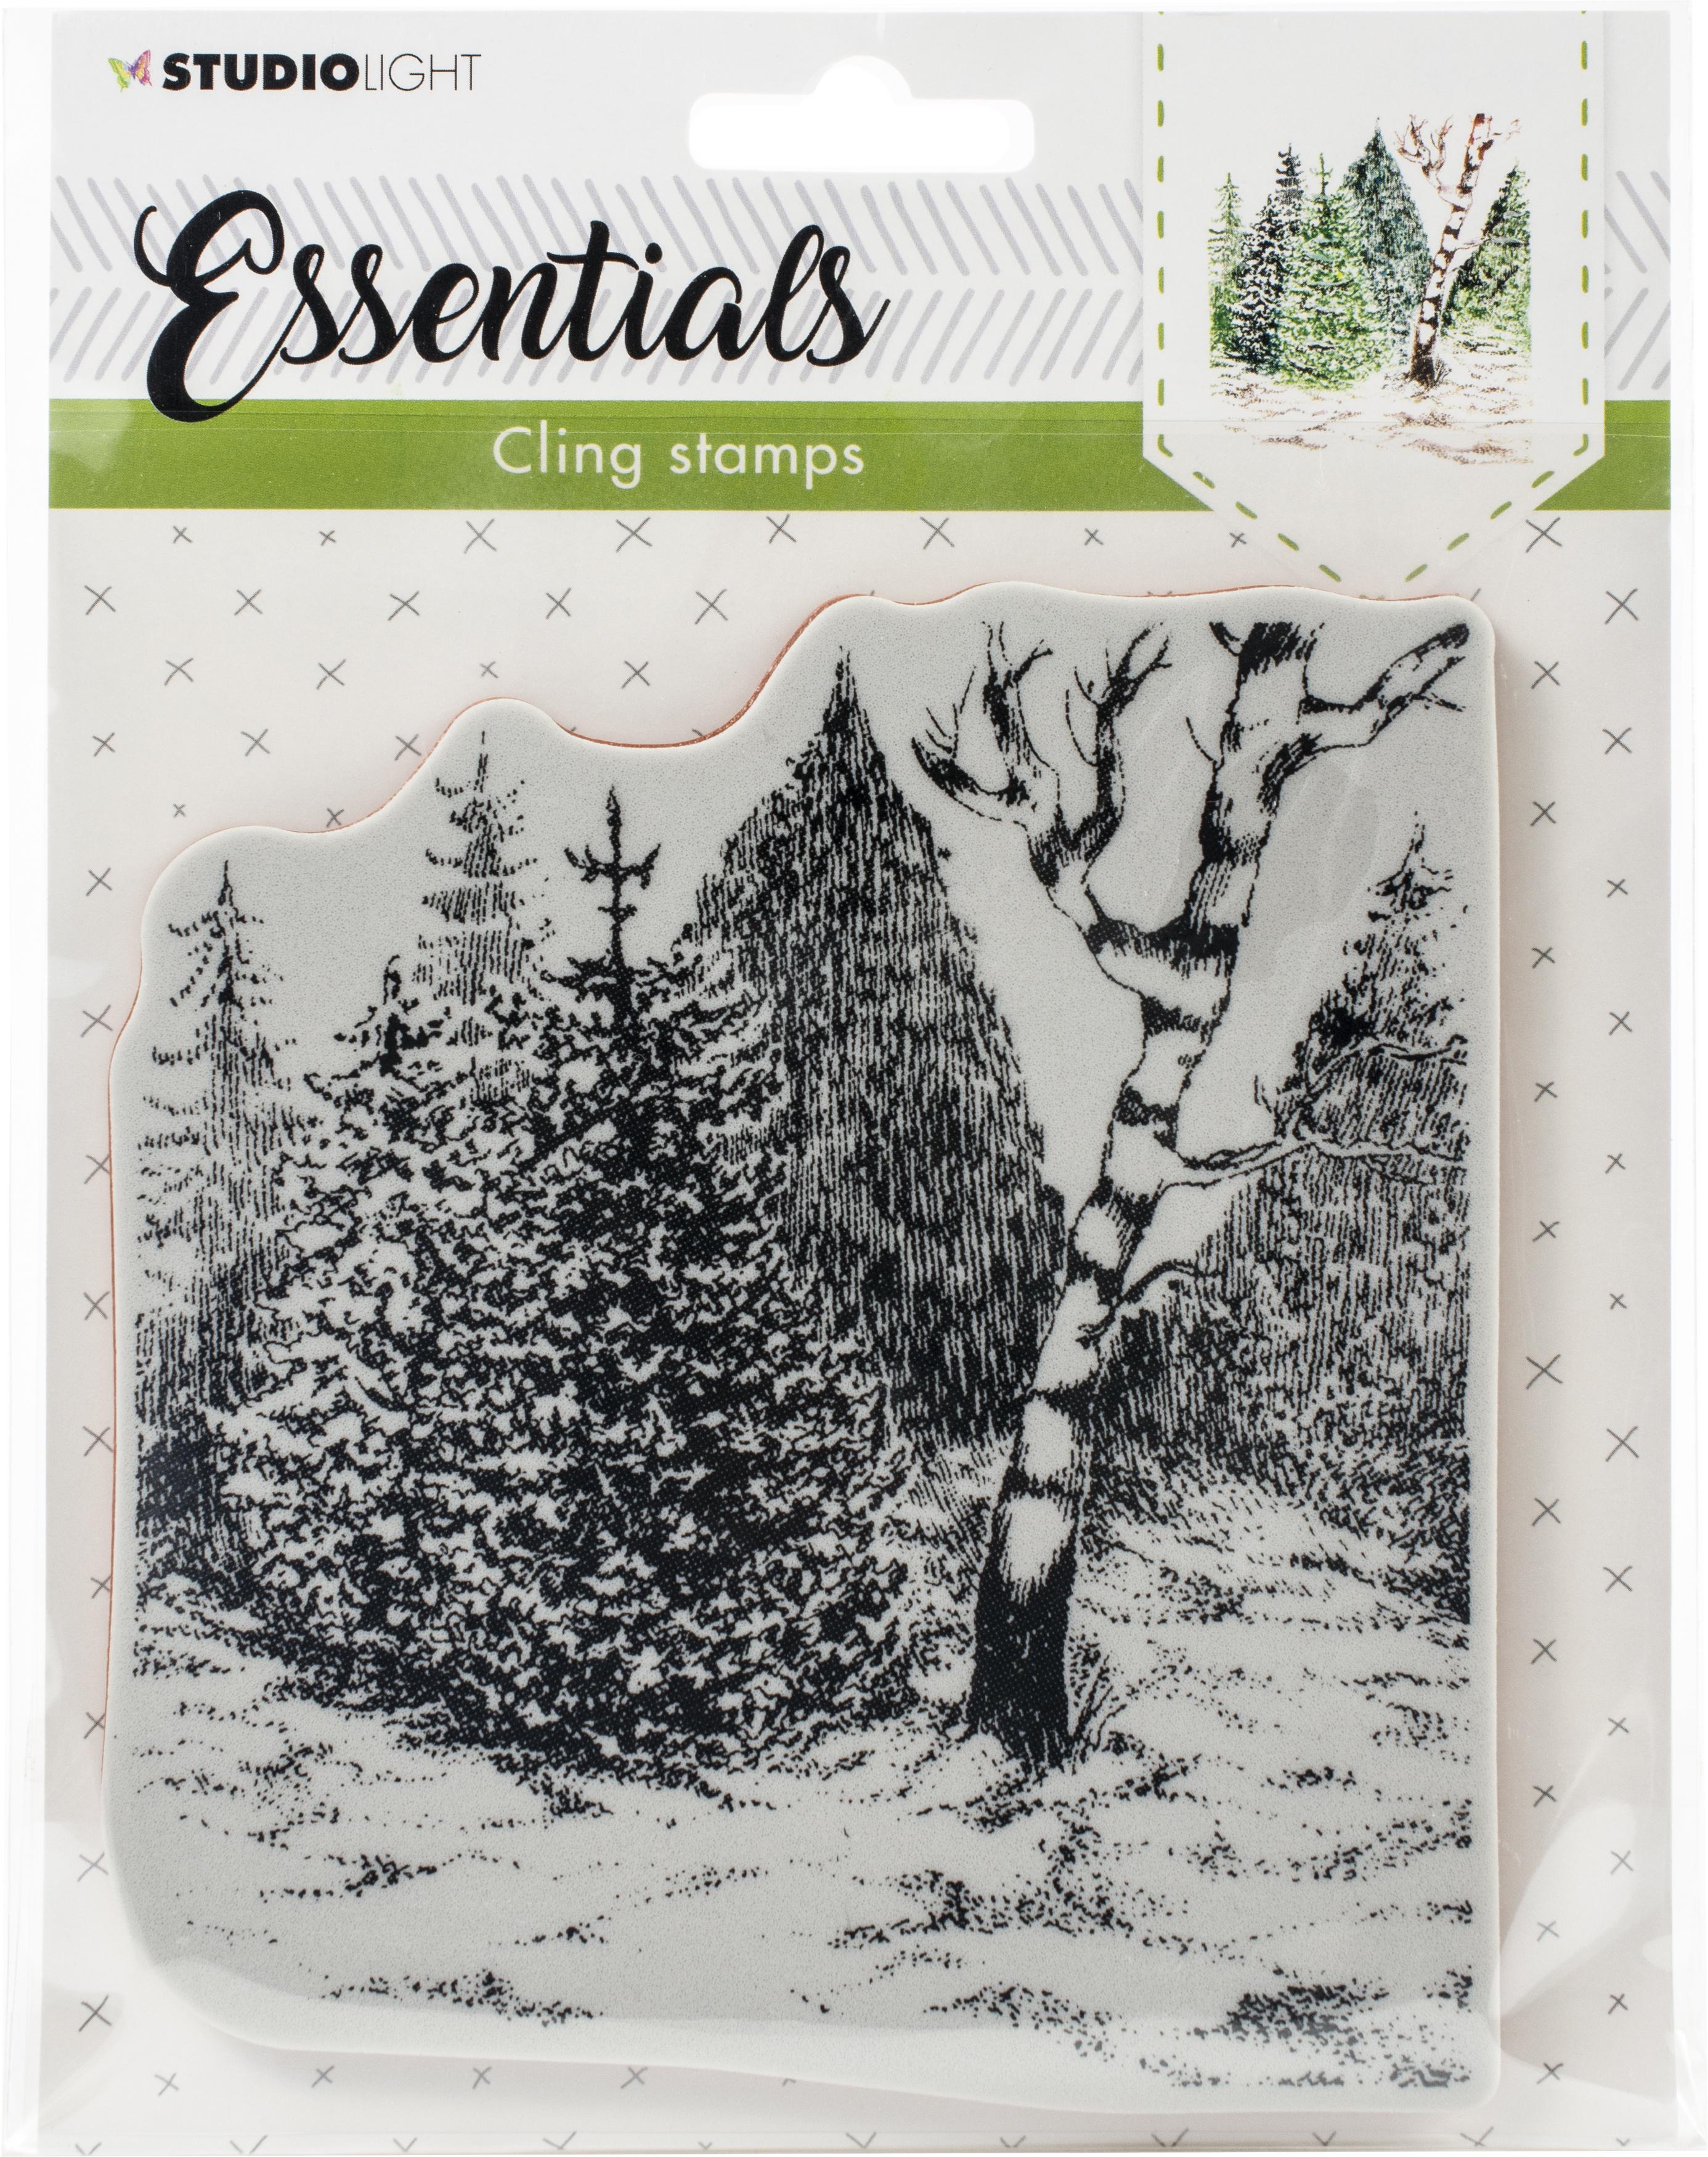 Studio Light Essentials #14 Stamp